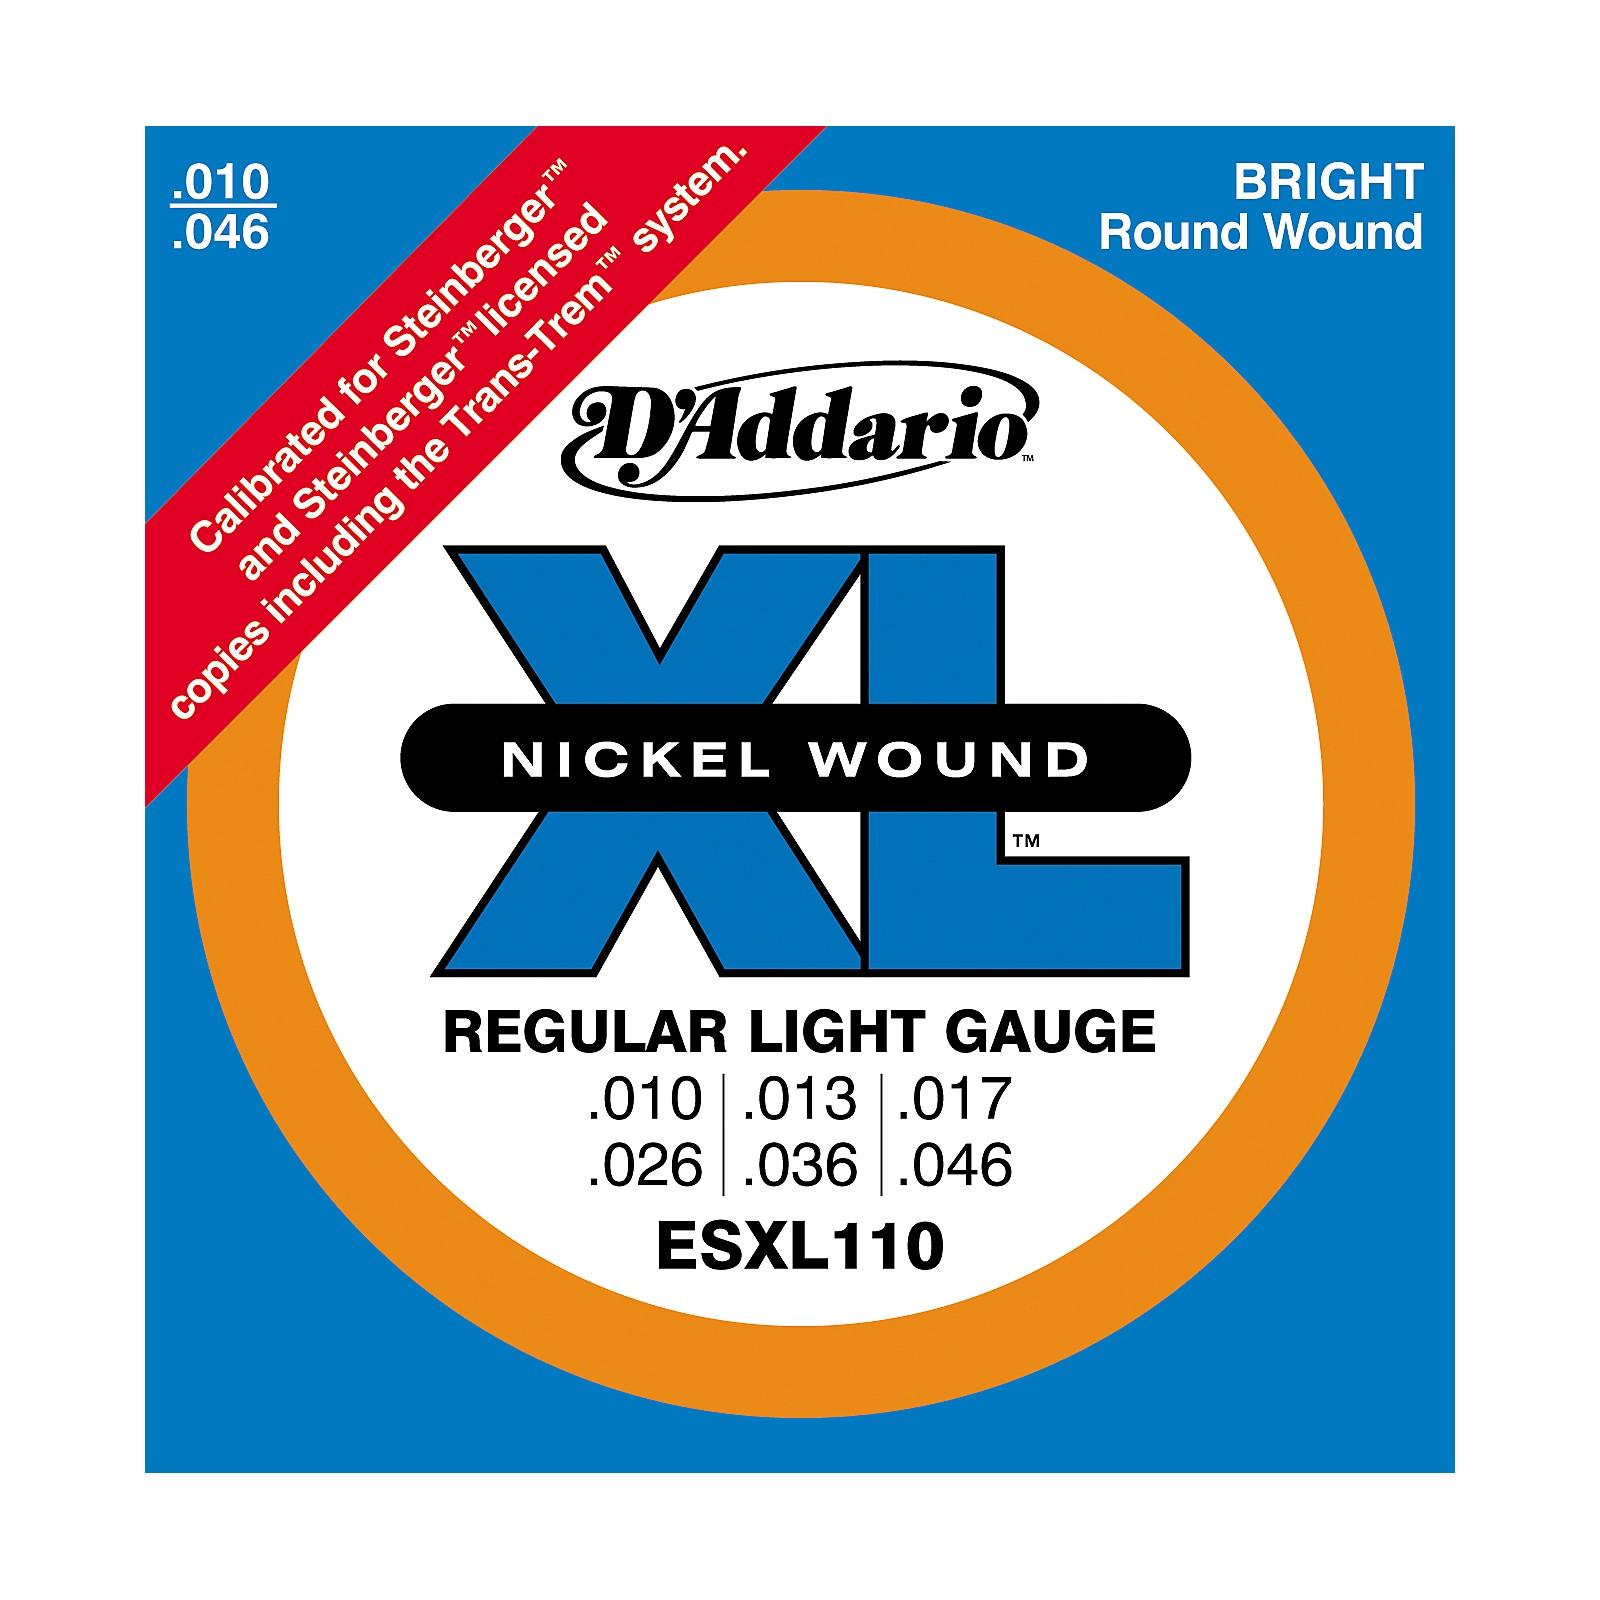 D'Addario ESXL110 Steinberger Regular Light Double Ball End Electric Guitar Strings